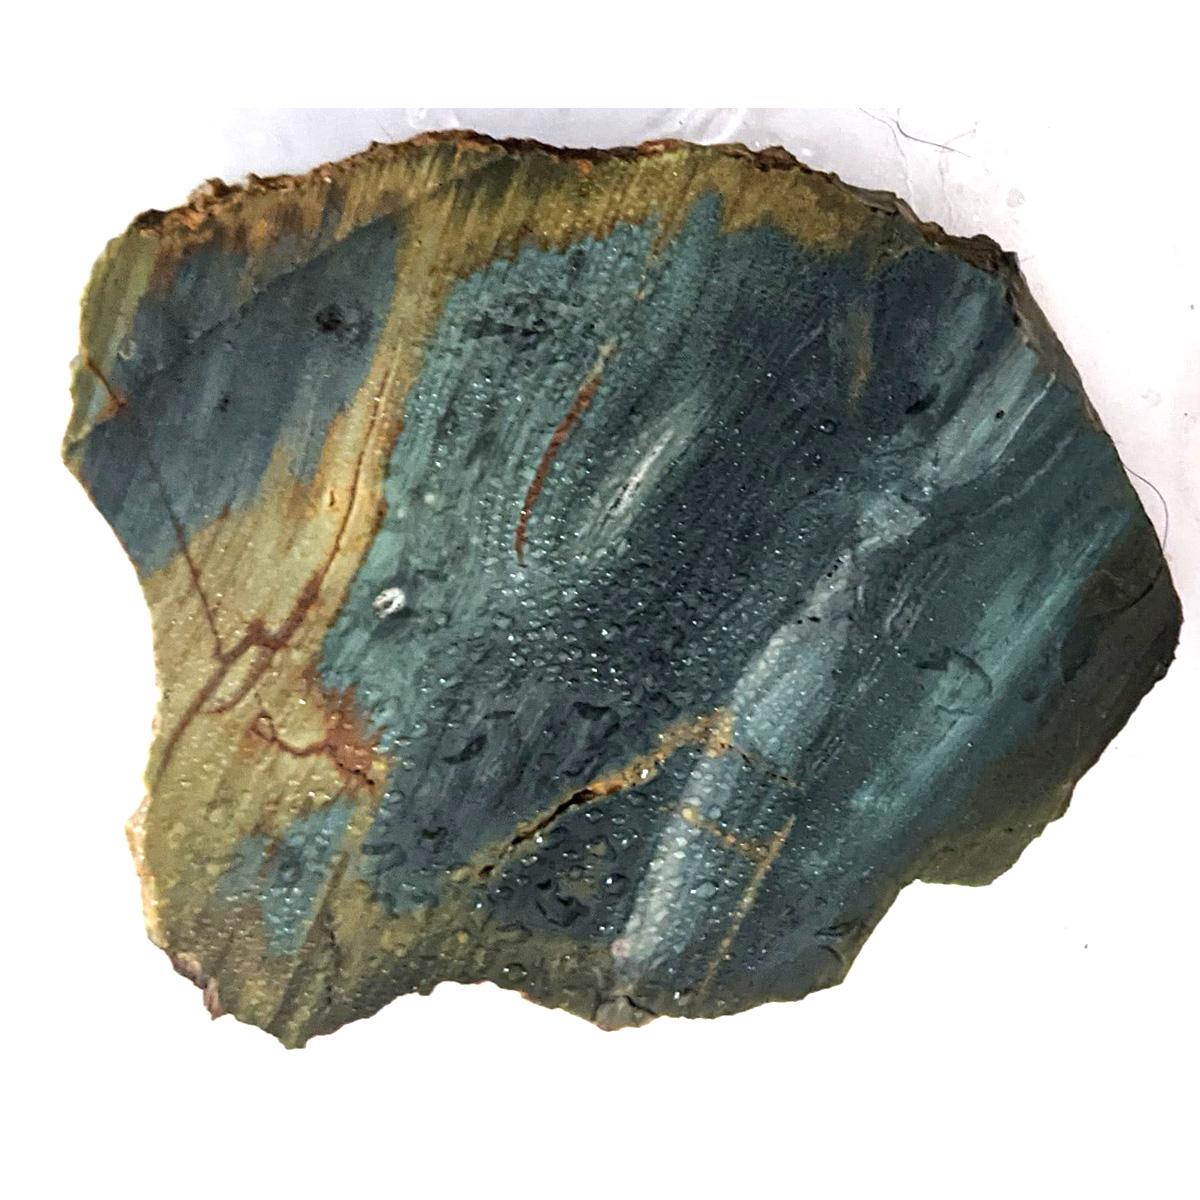 7640-caldera-gary-green-2